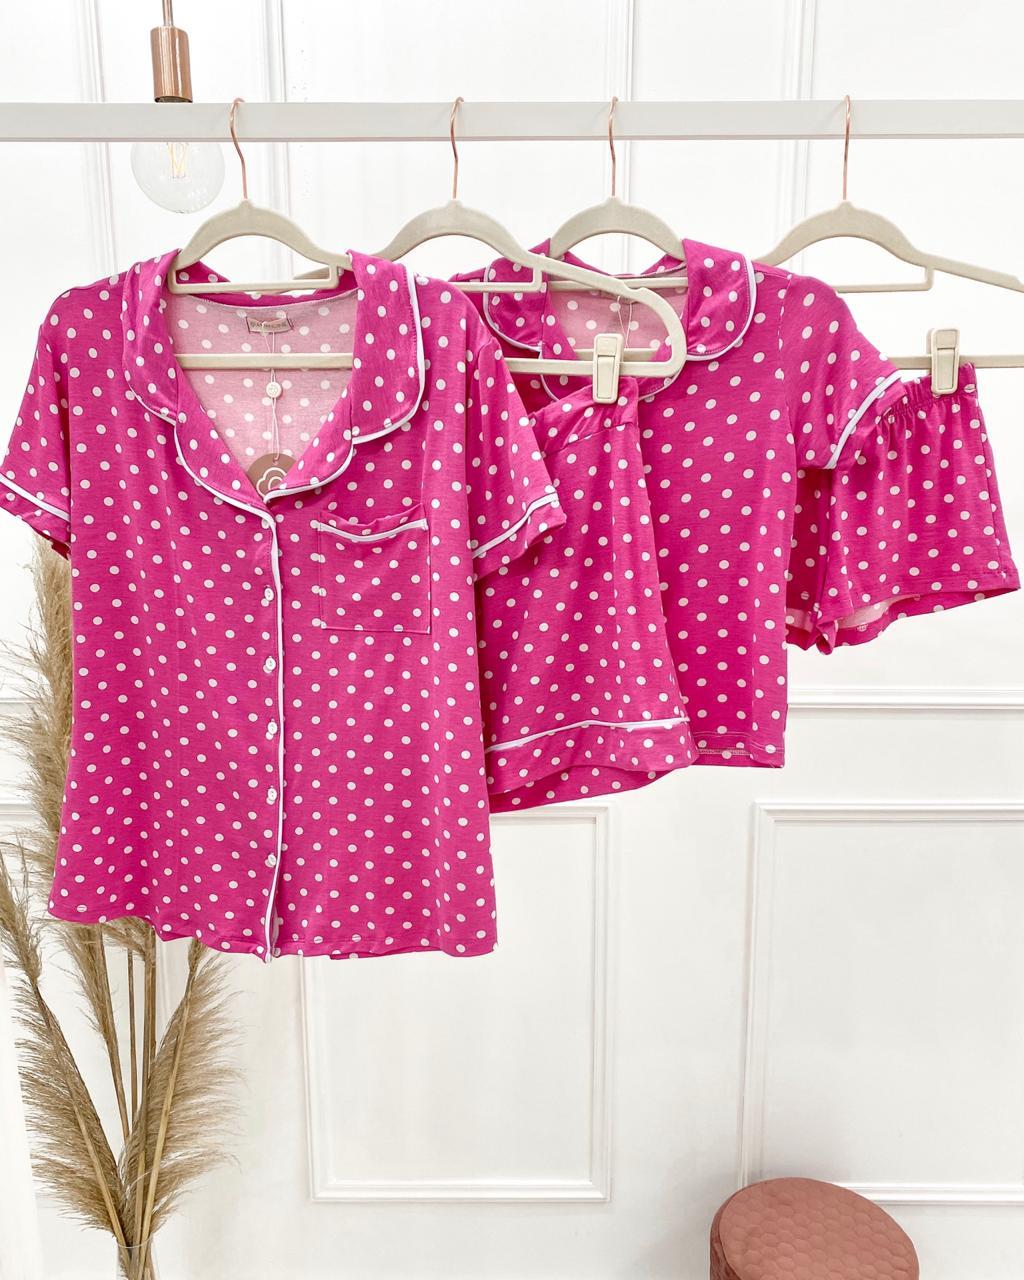 Kit de Pijamas Mãe e Filha